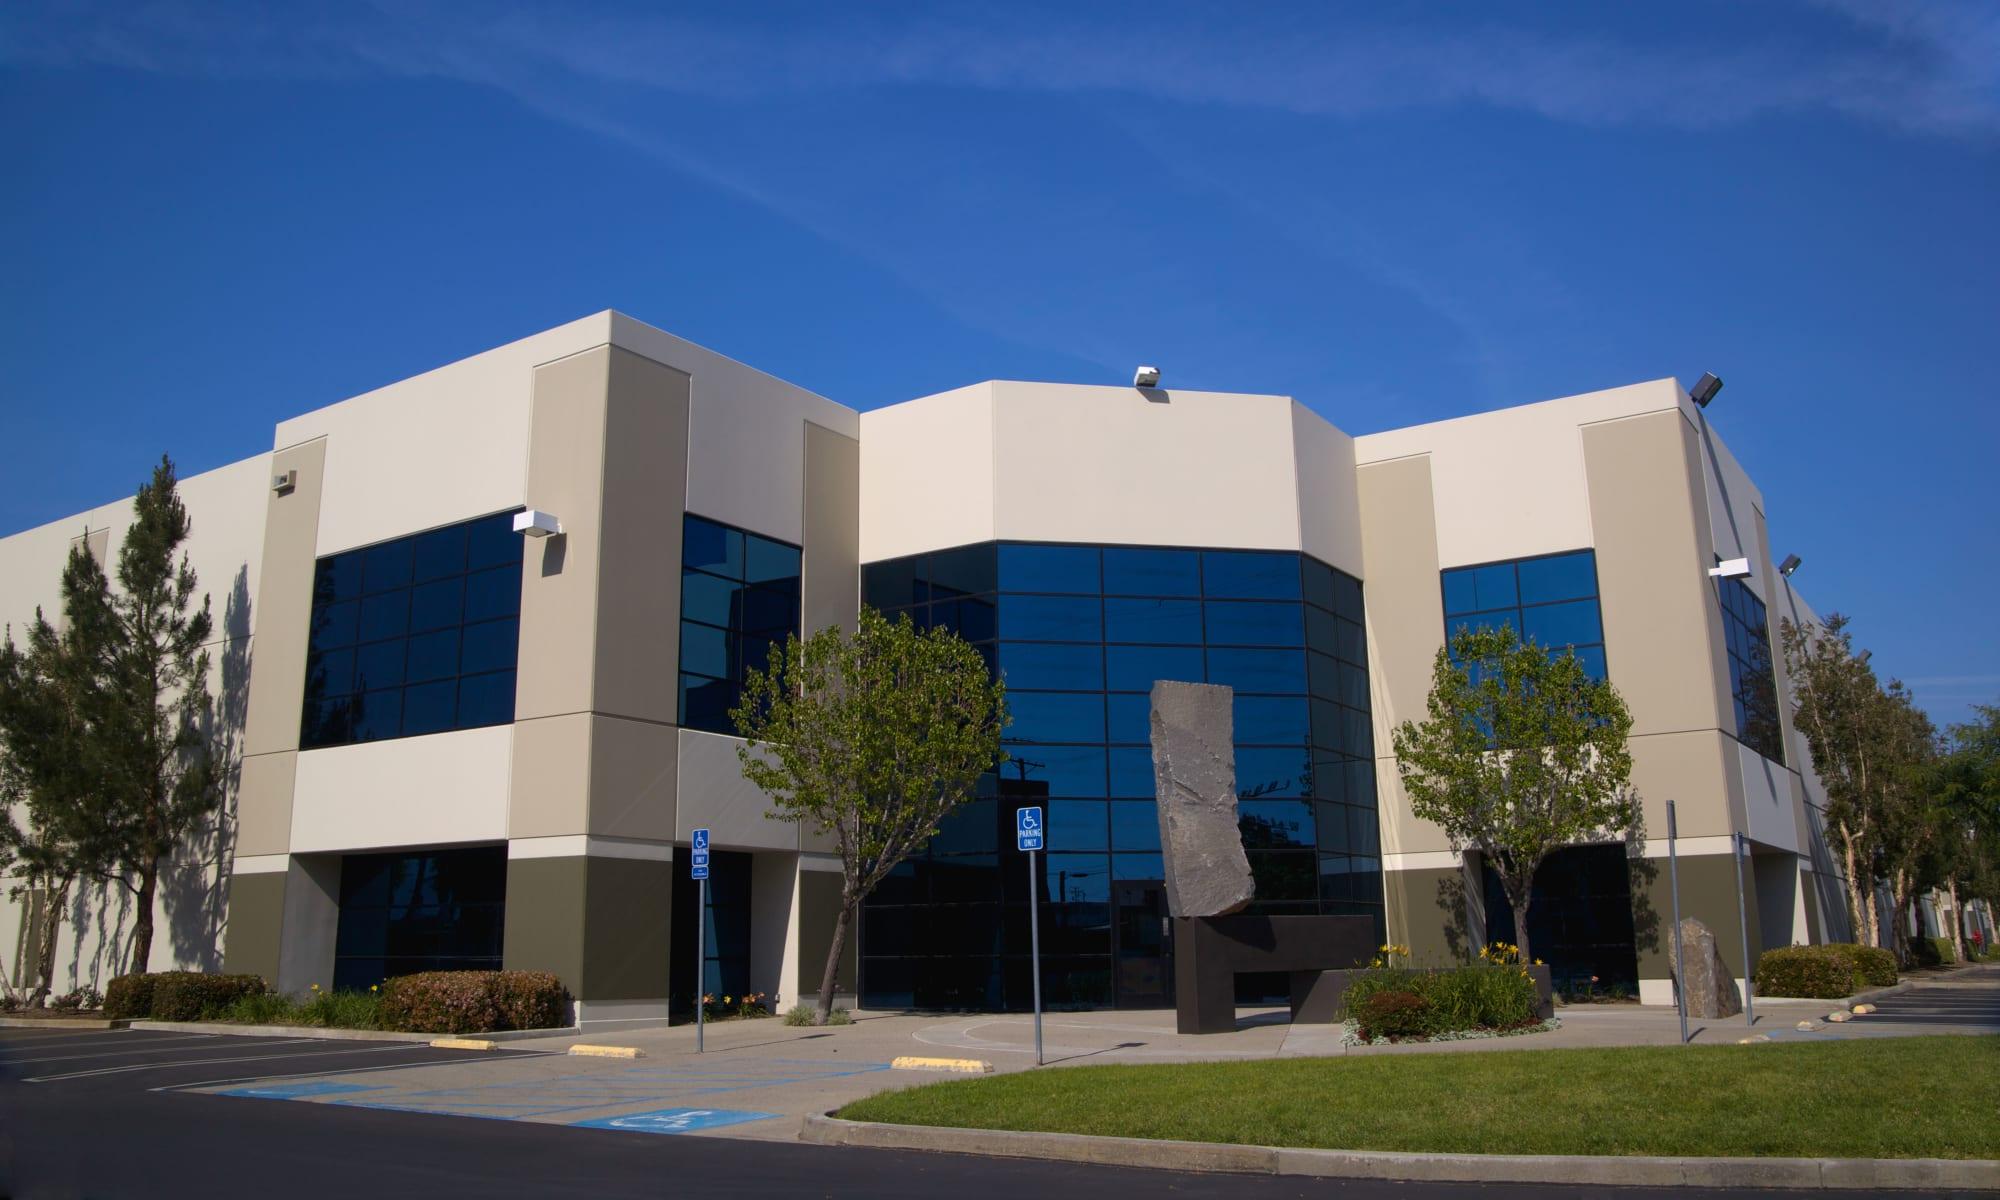 Fullerton Business Center apartments in Fullerton, California